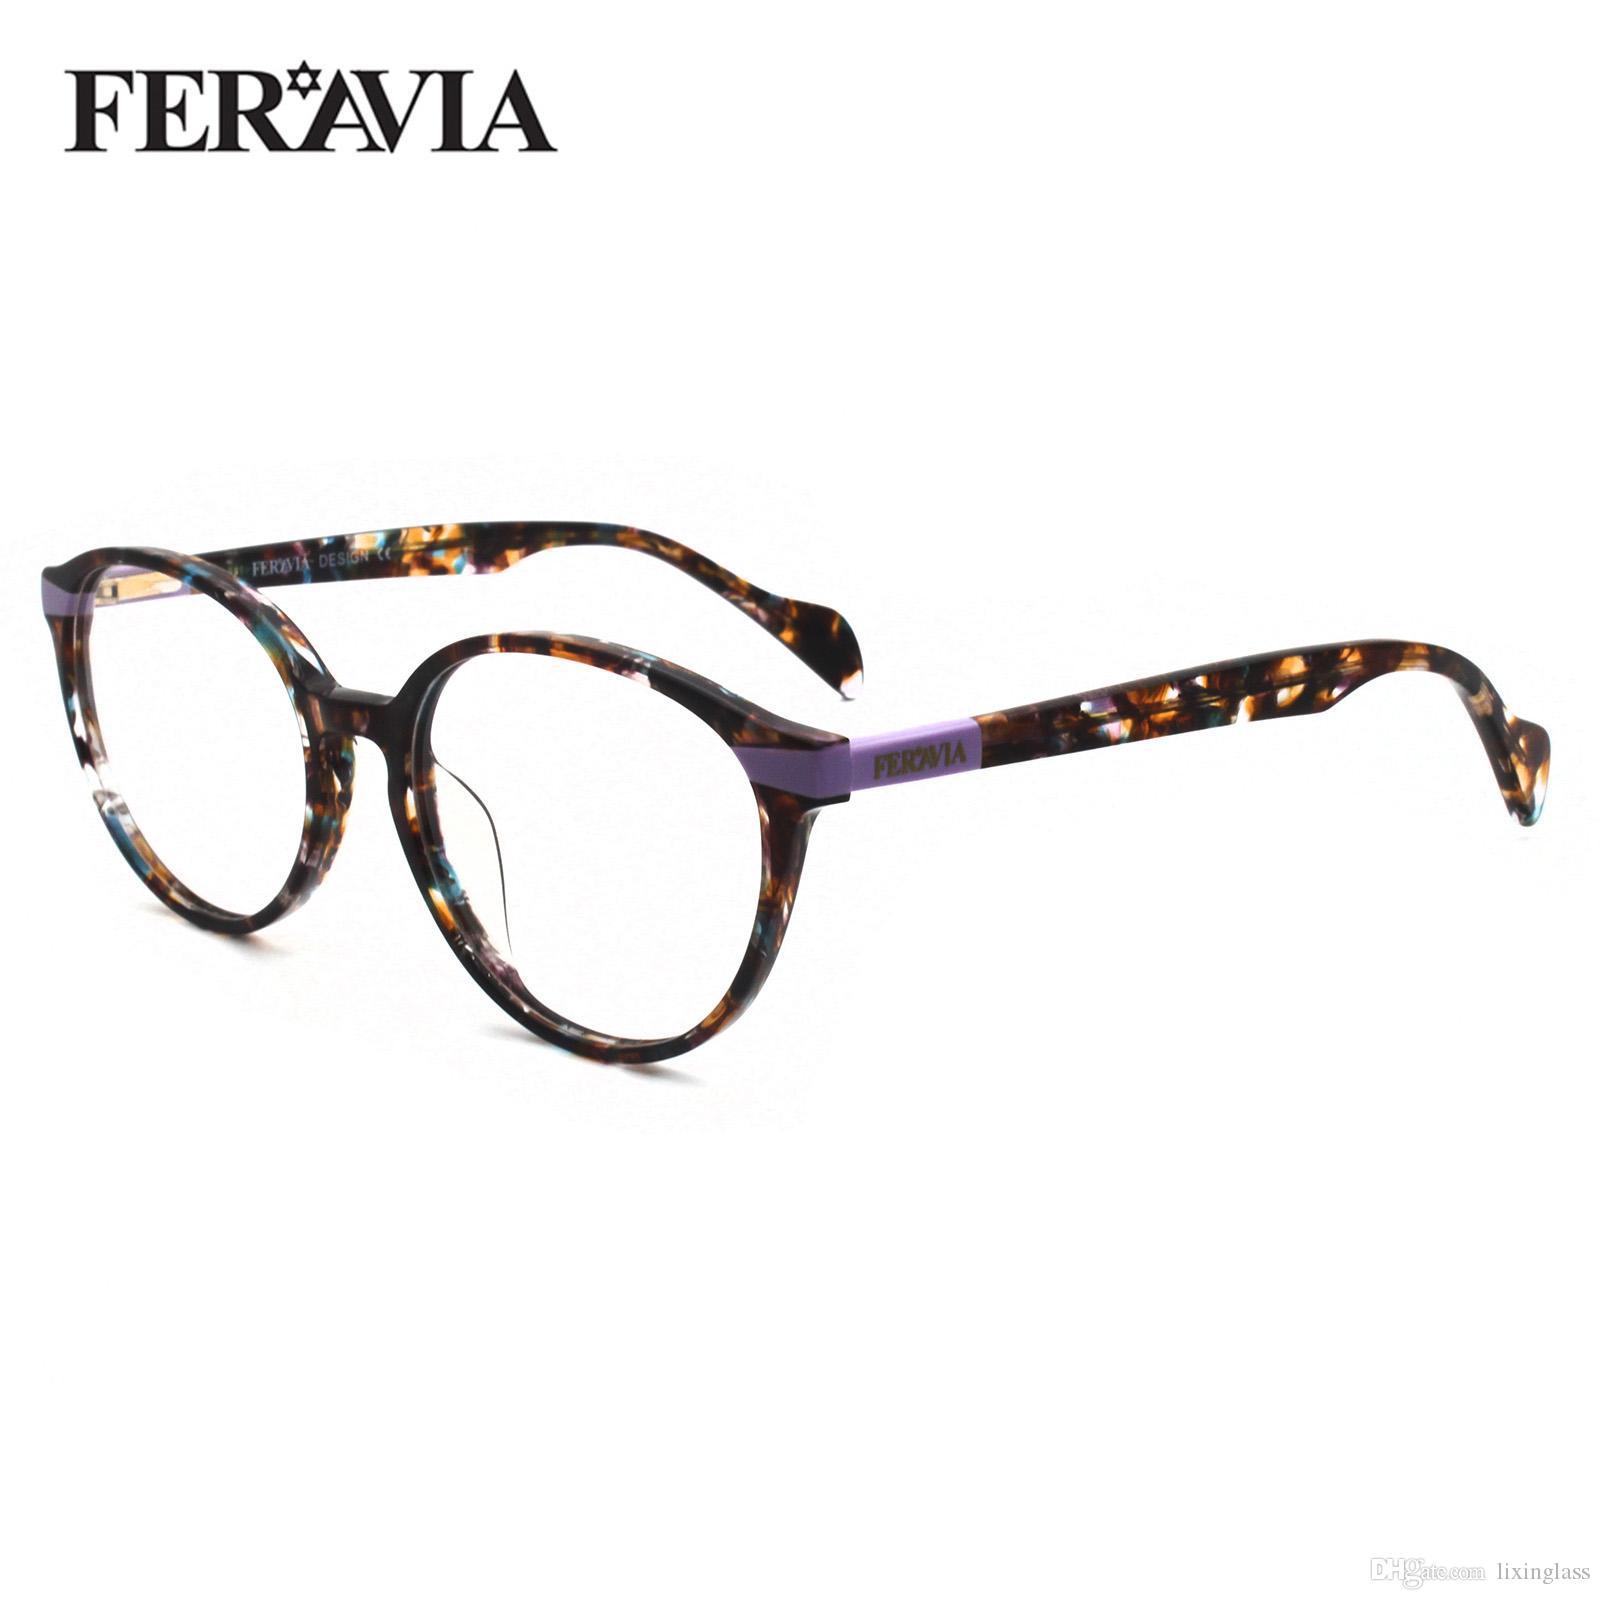 New Classic Round Lady зрелищ Рамки ретро печати очки Рамка Очистить Мода Optical очки кадр очки FVG7137